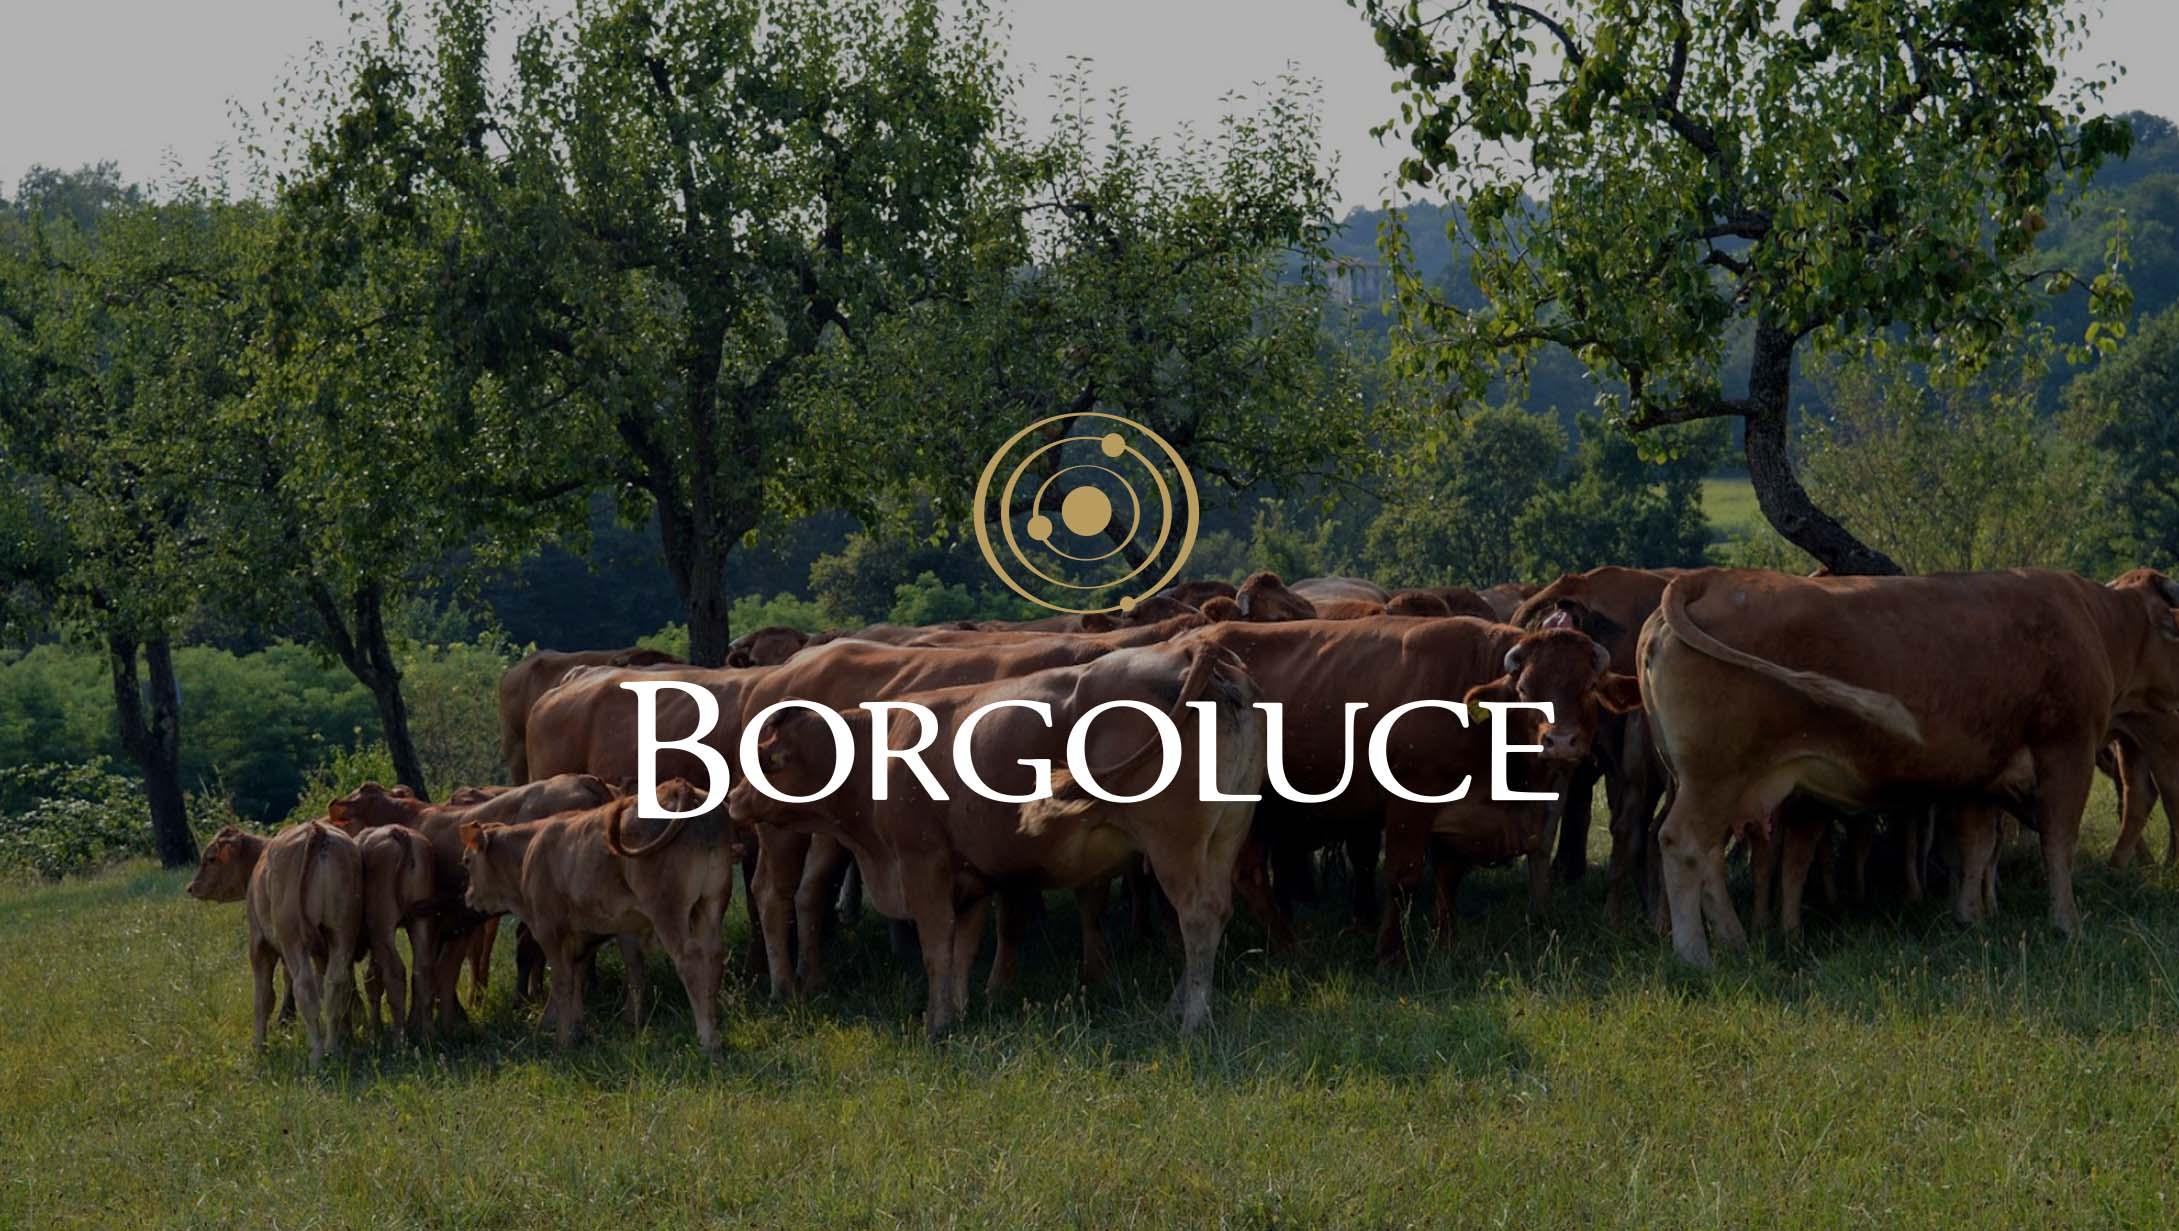 Borgoluce